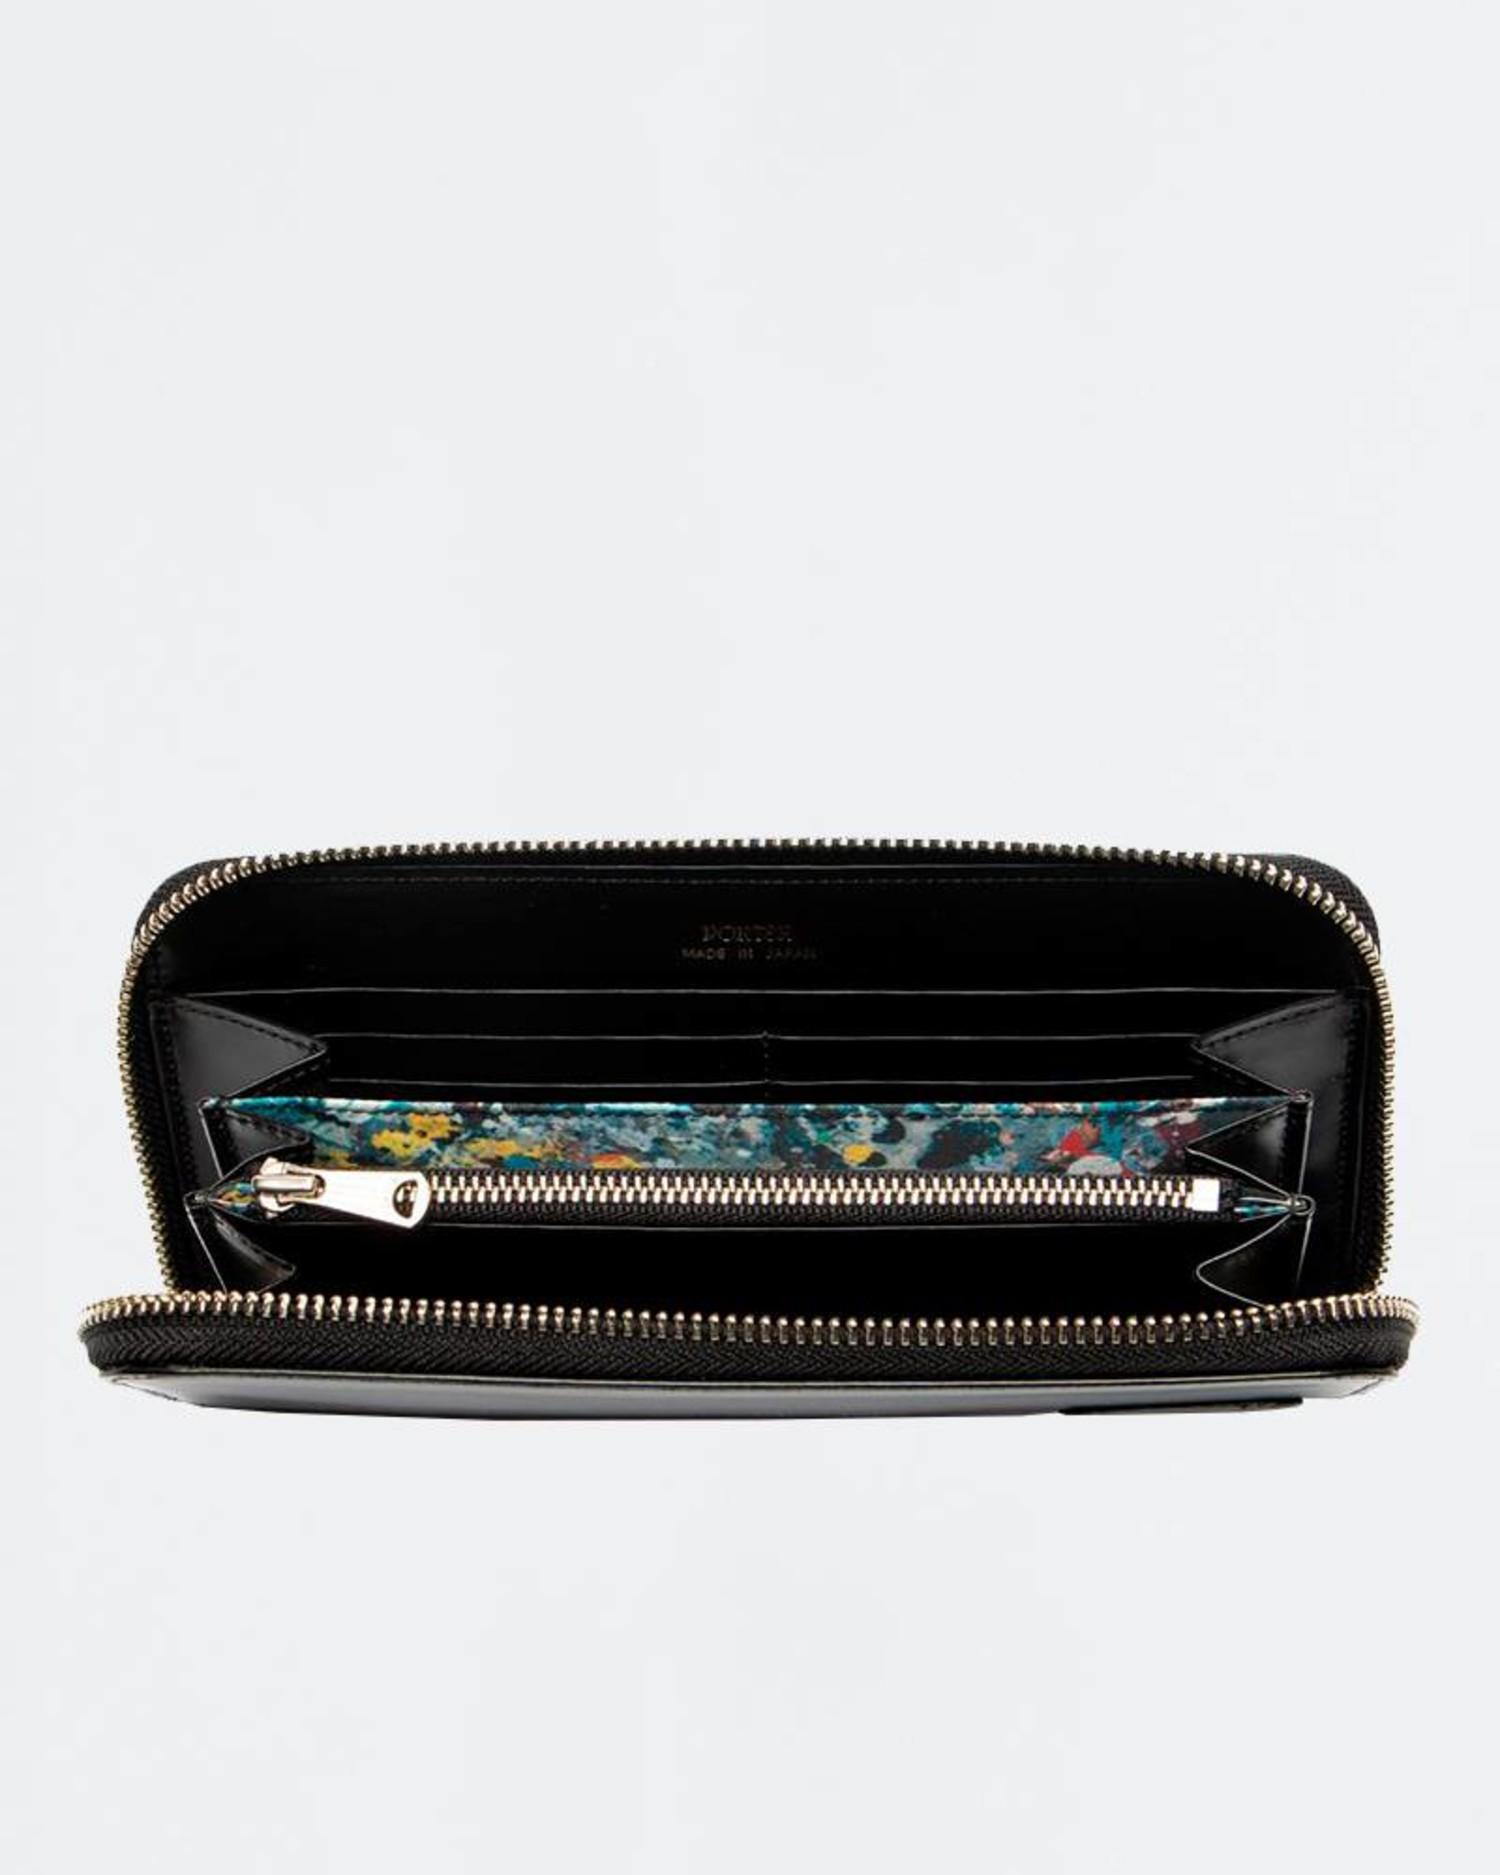 Medicom Toys x Jackson Pollock Studio Long Wallet by PORTER